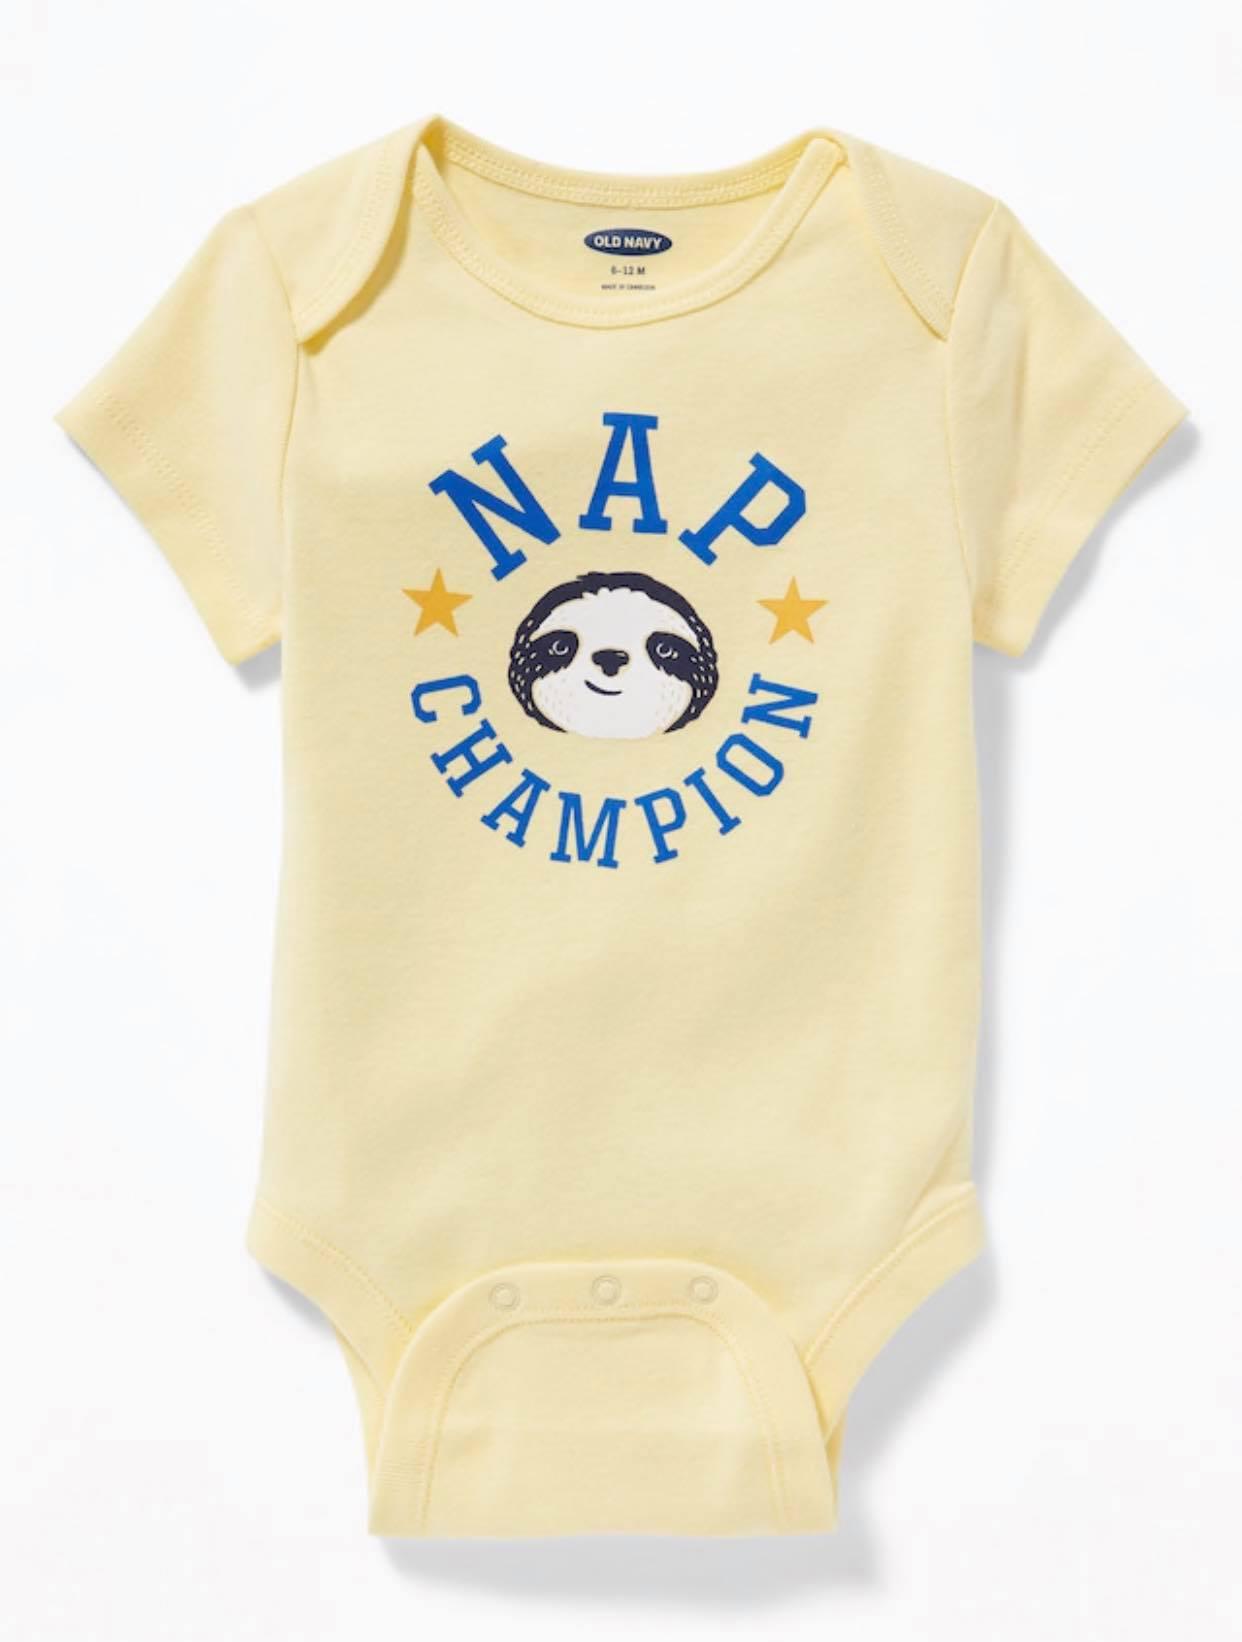 Bodysuit OldNavy 05 [Boy] - Vàng/Nap Champion